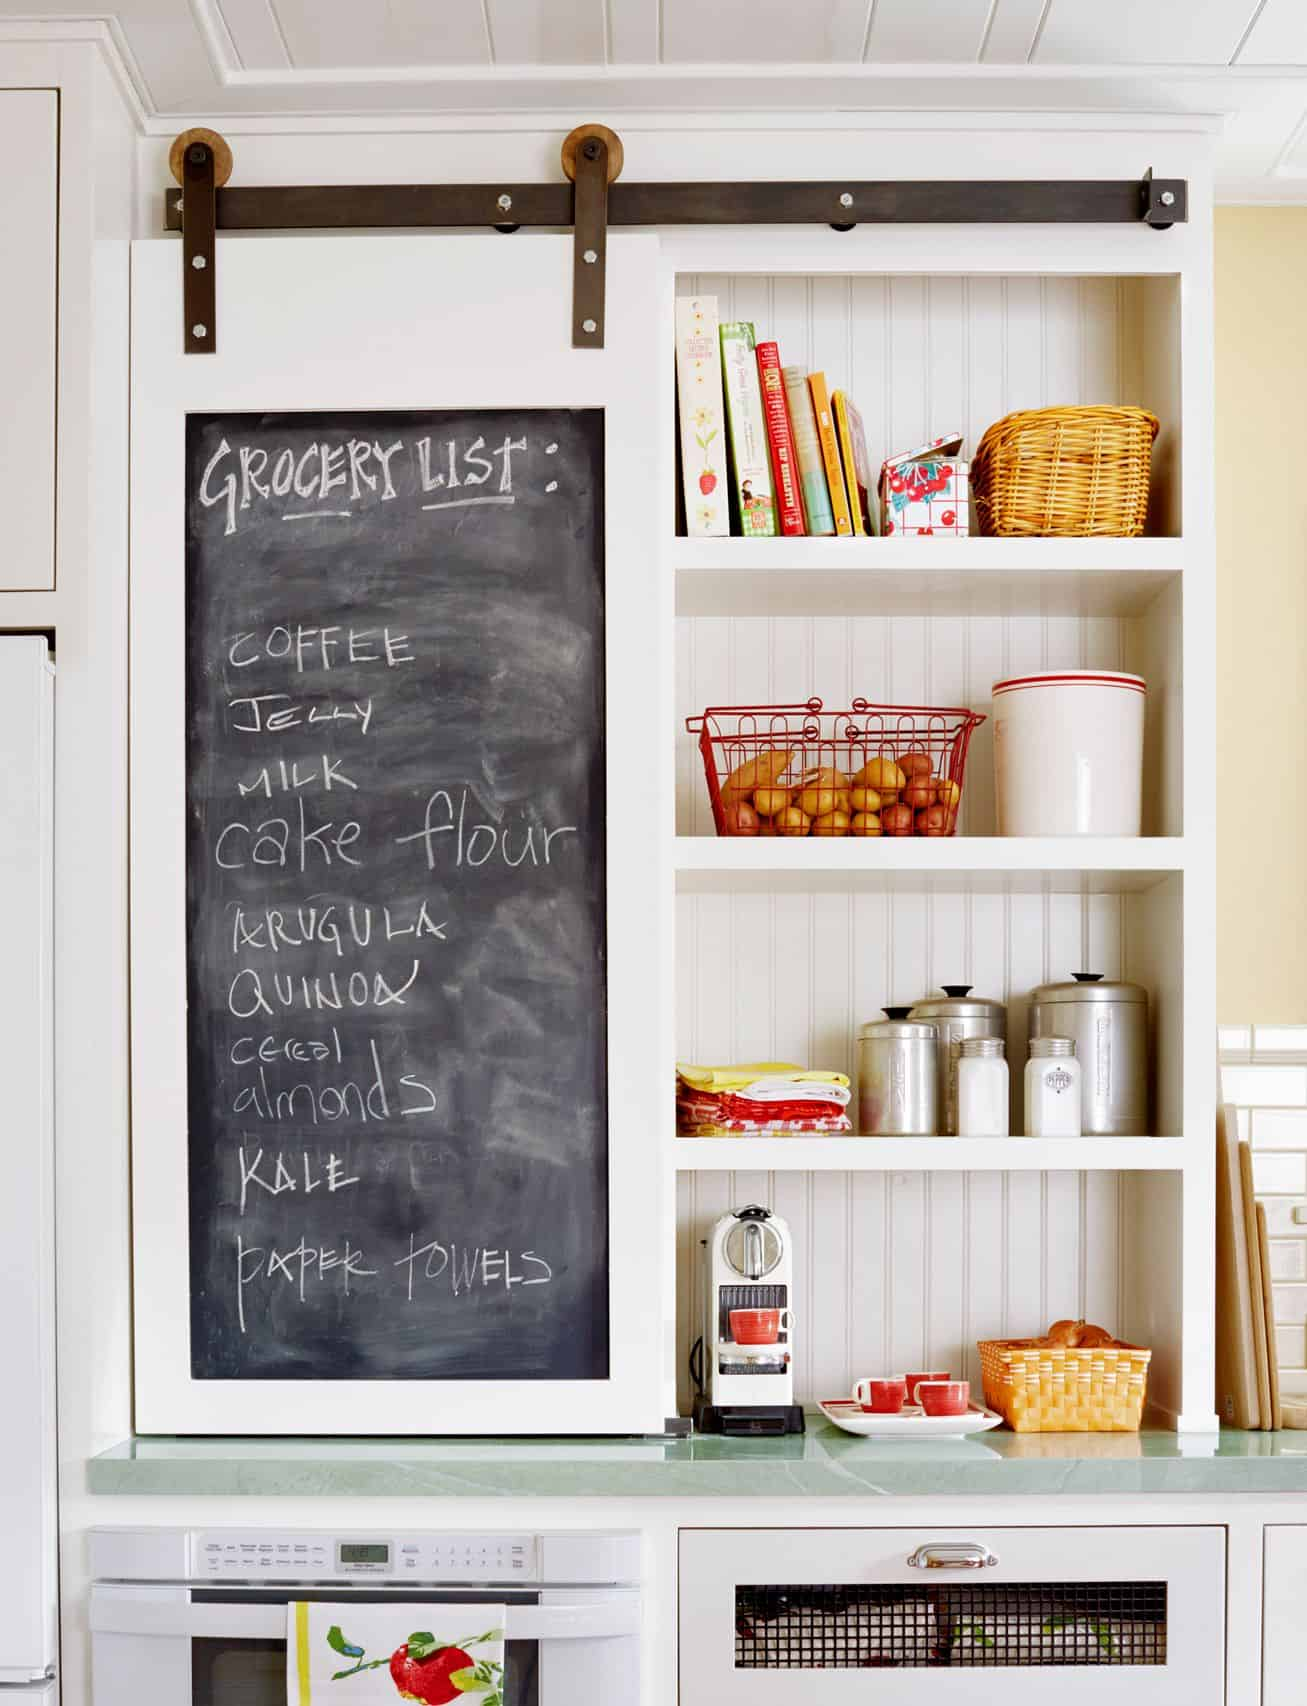 How cool is a chalkboard barn door cabinet?